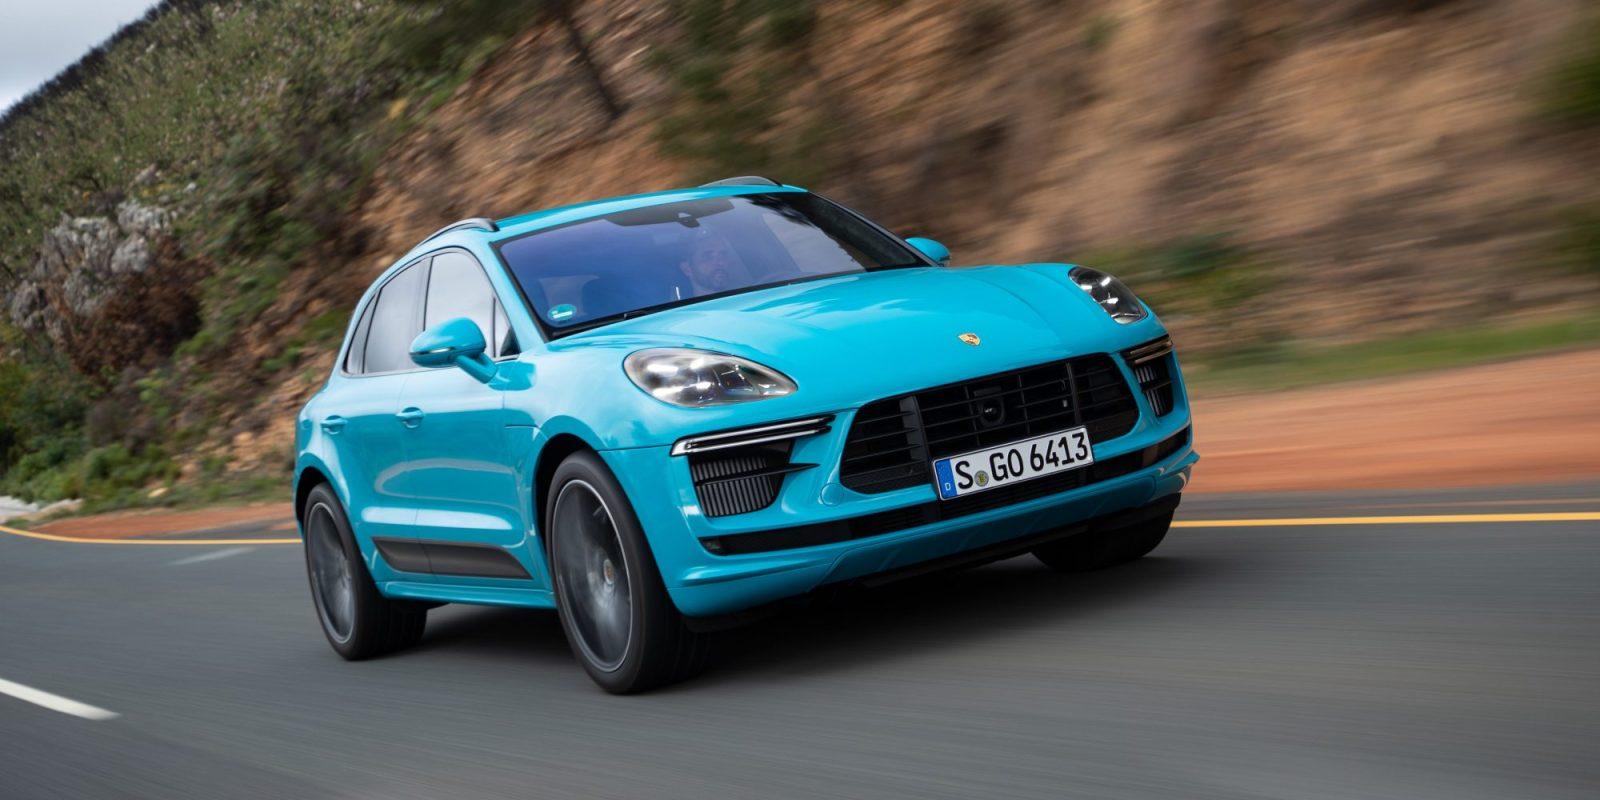 Porsche testing 4-motor electric SUV drivetrain – the next Macan?